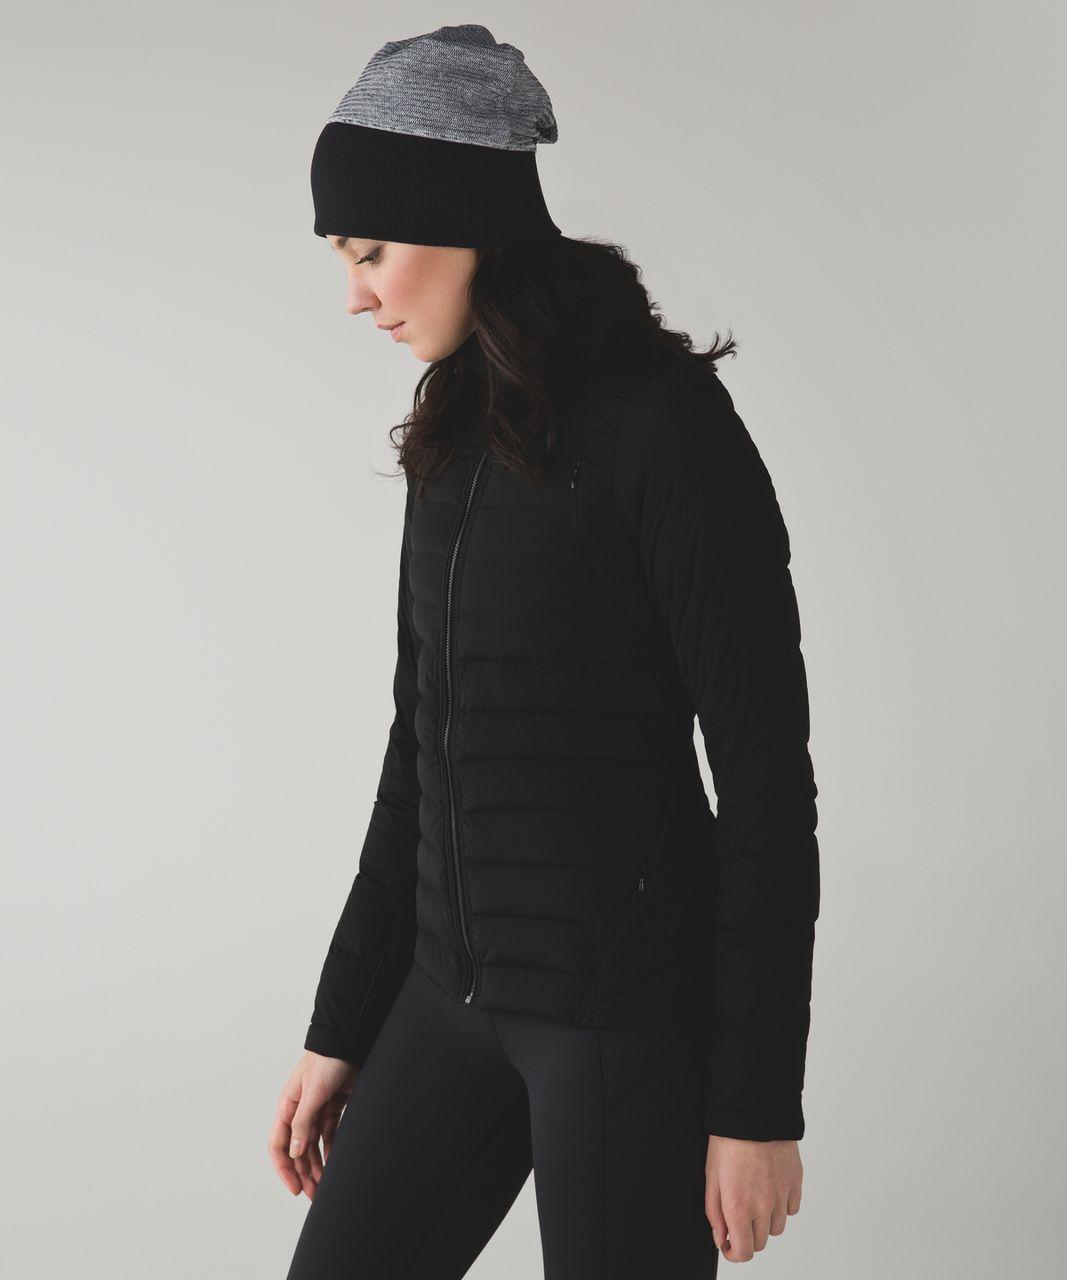 Lululemon Run With Me Toque - Mini Check Pique White Heathered Black / Black